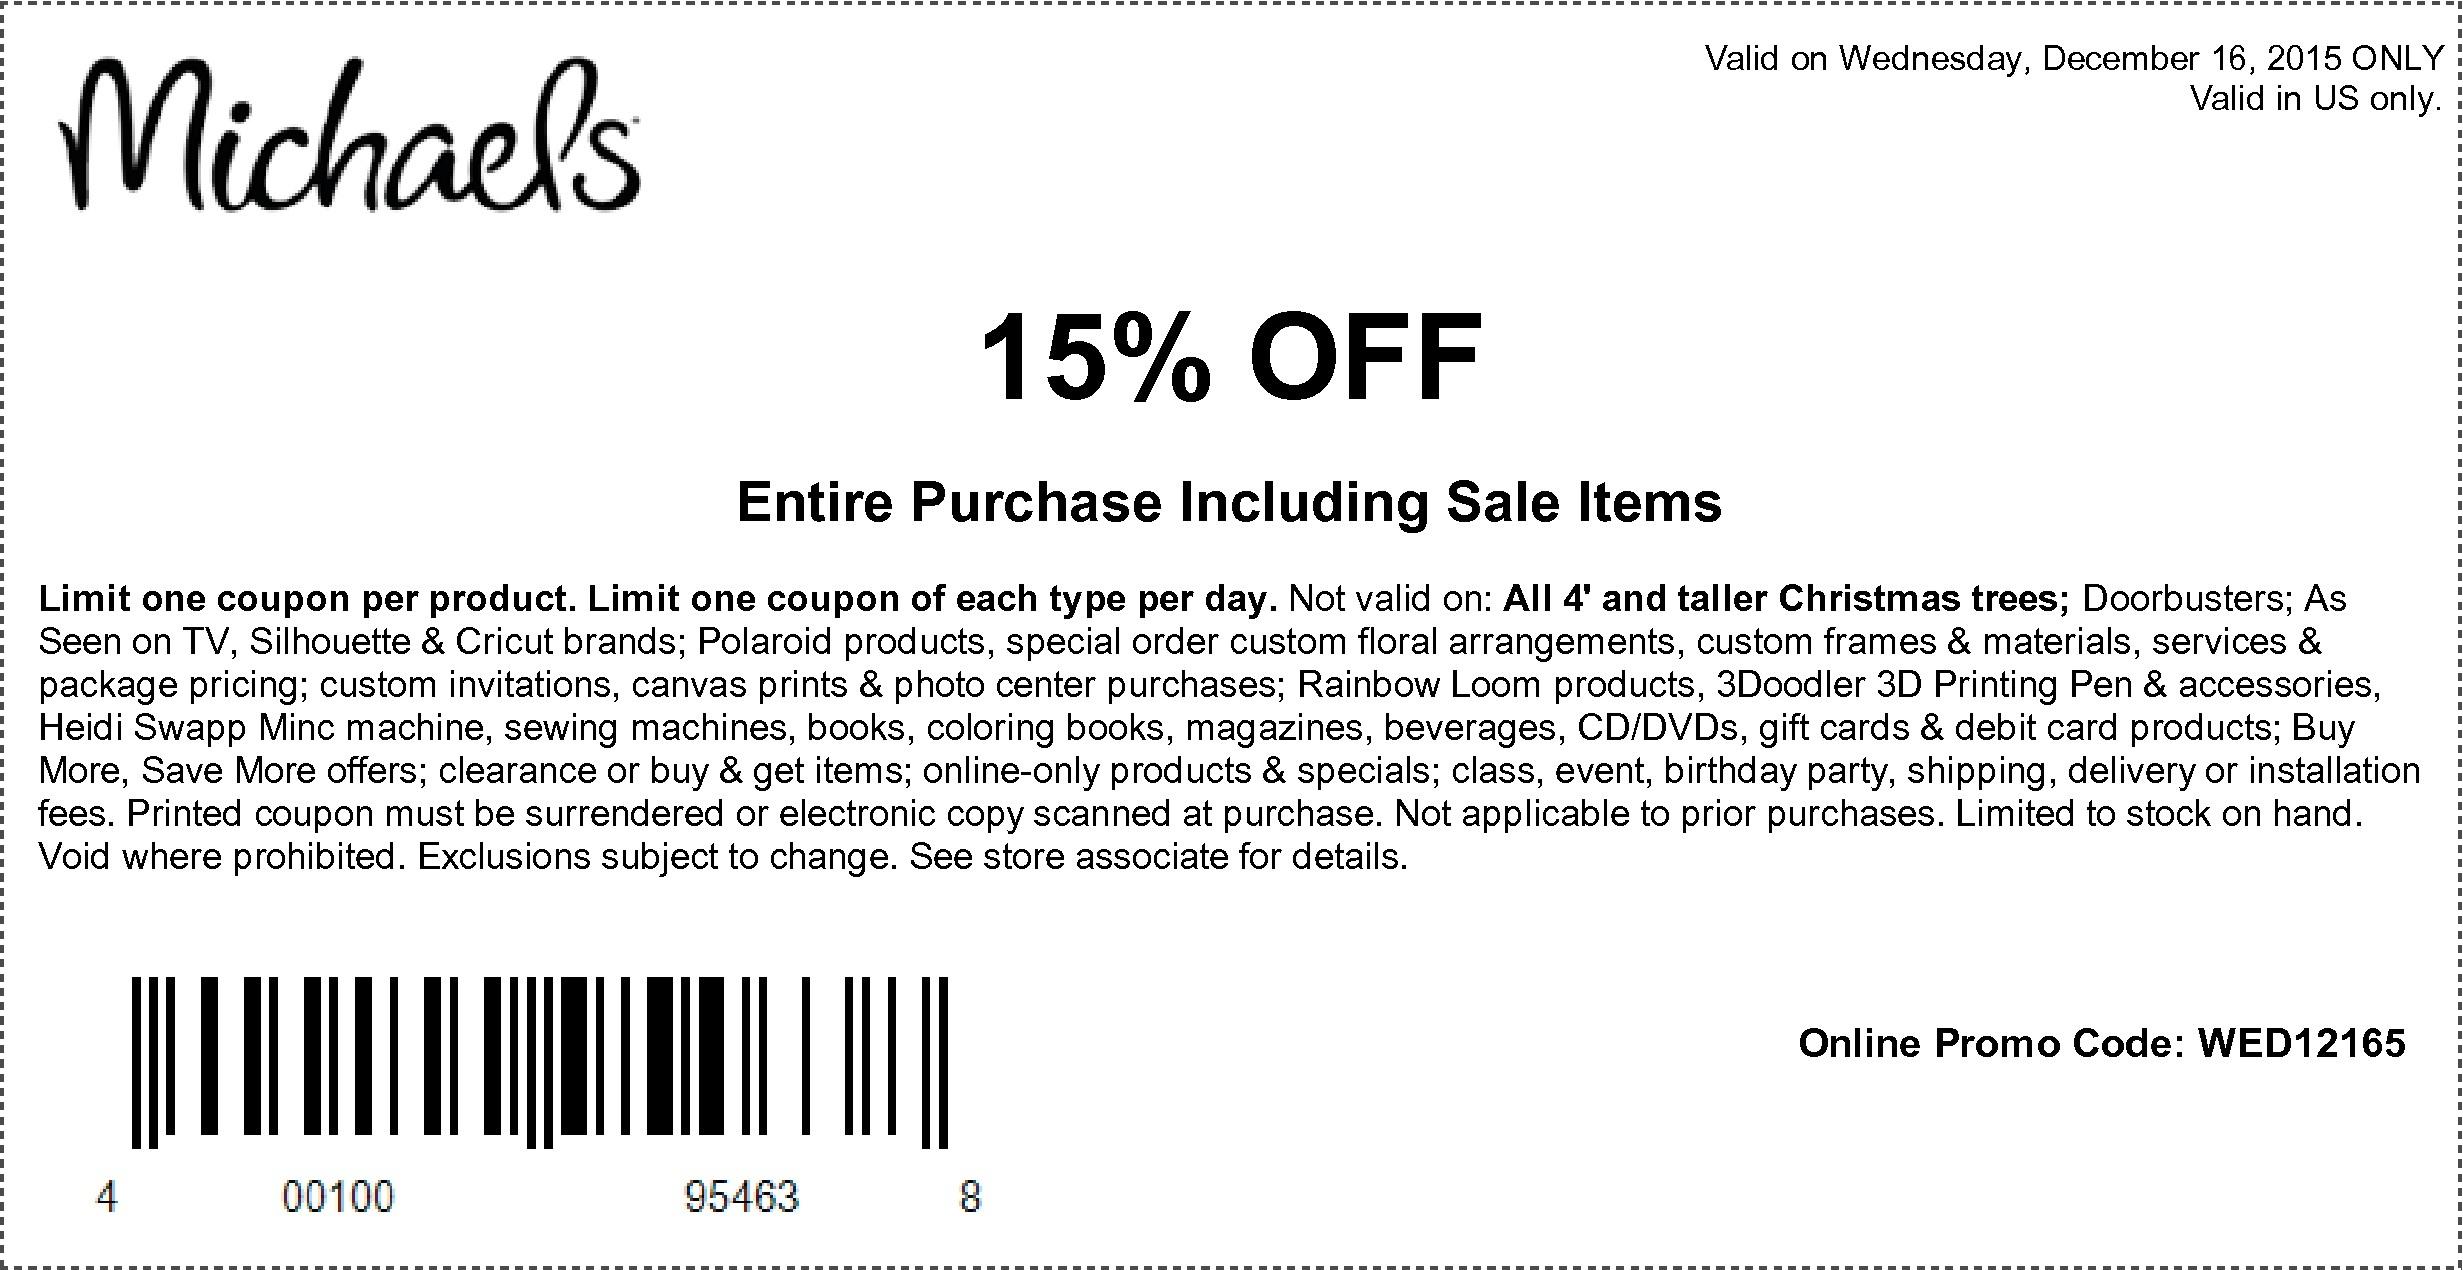 Michaels Free Printable Coupons   Printable Coupons Online - Free Printable Michaels Coupons